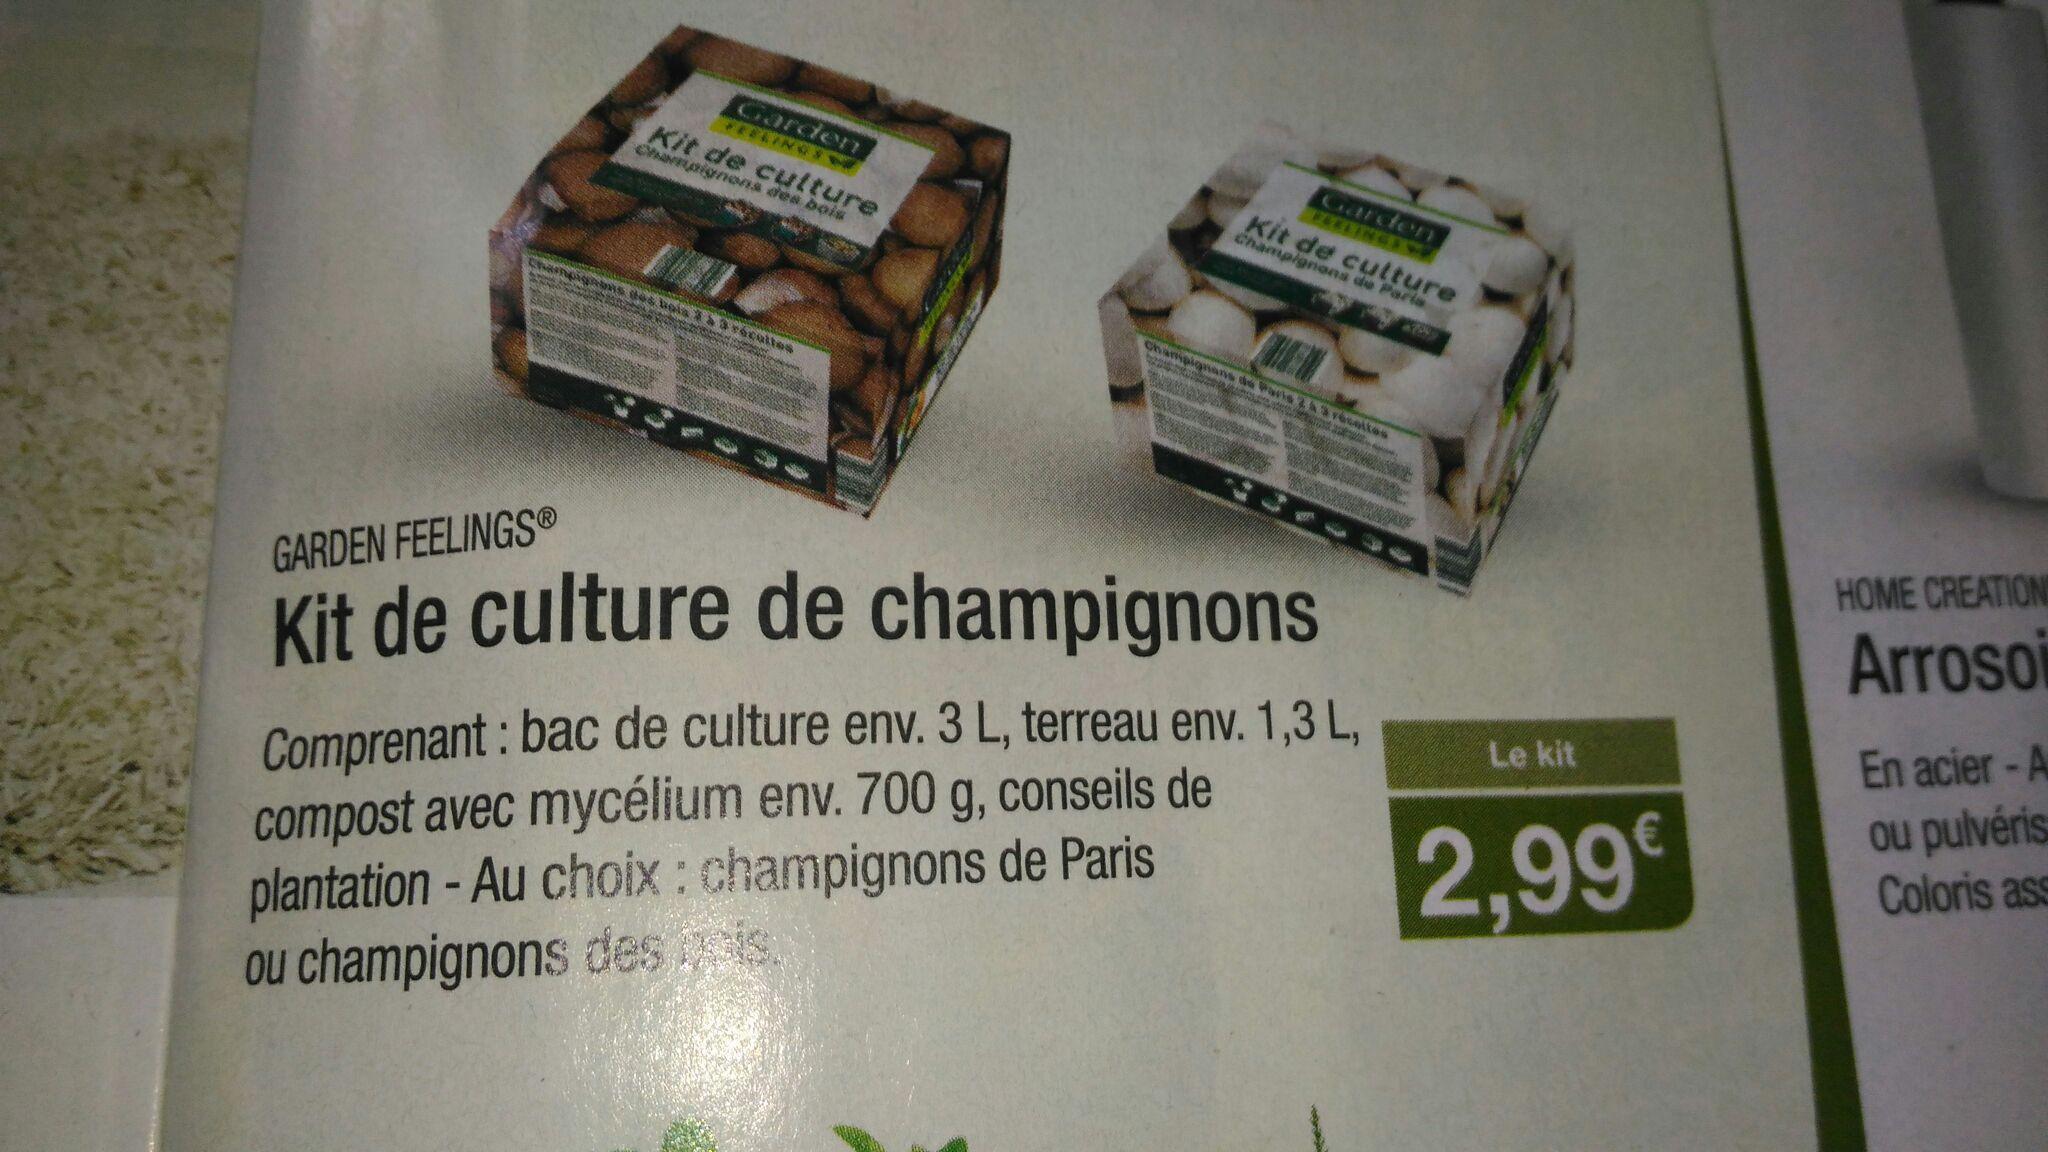 Kit de culture de champignons Garden Feelings (bac de culture + terreau + compost)